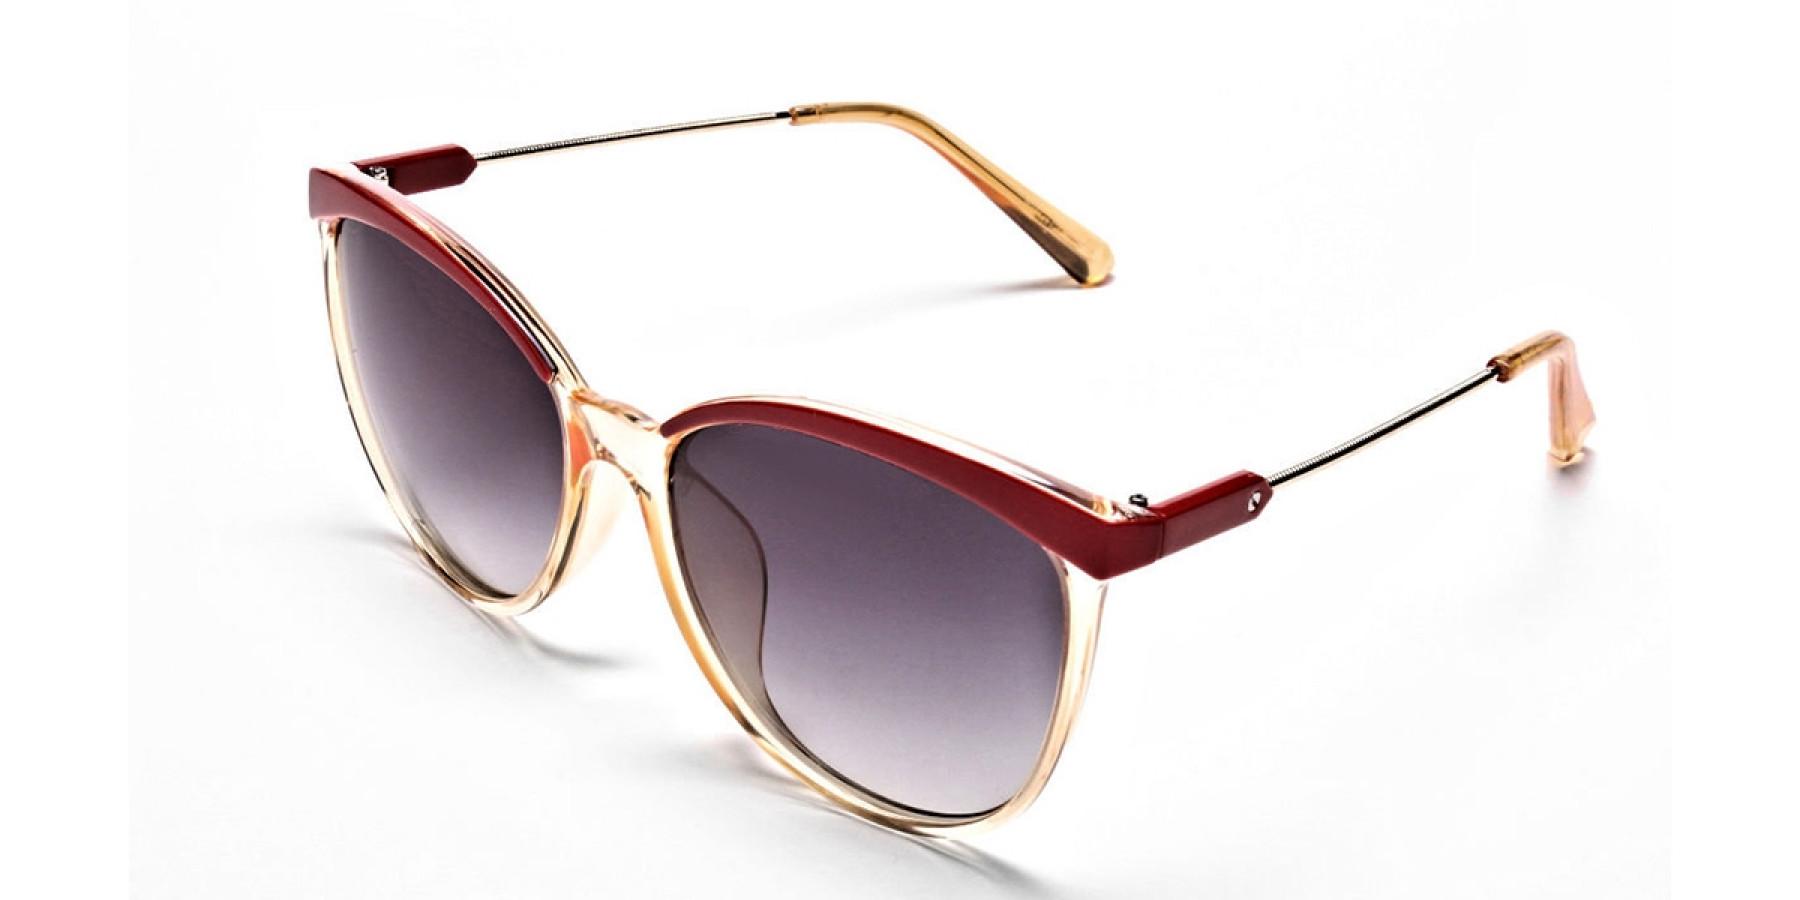 Red & Gold Browline Super Glam Sunglasses -2